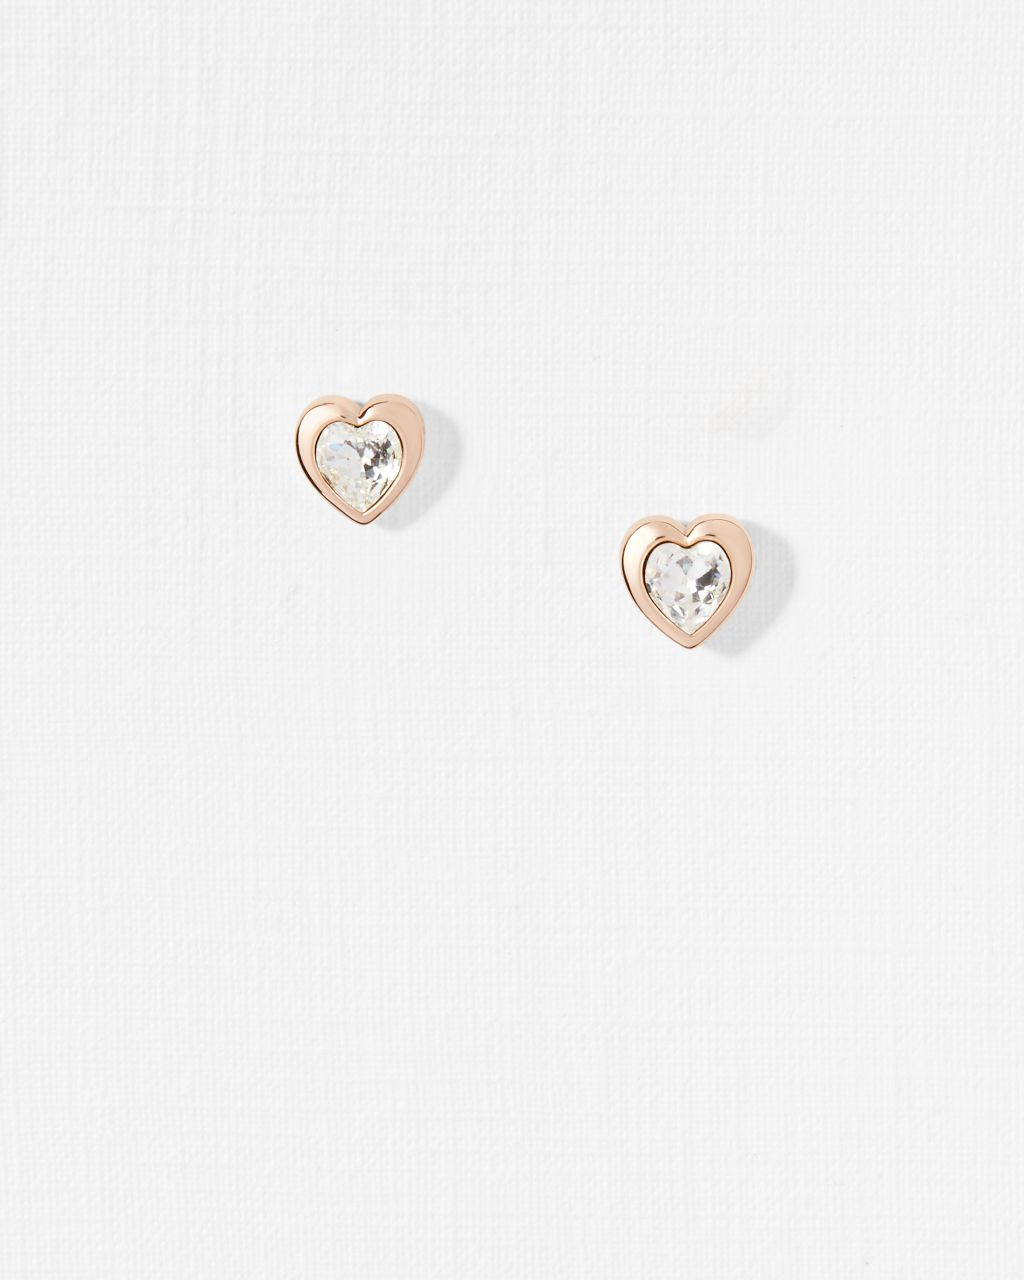 TED BAKER Herzförmige Ohrringe Mit Kristallen | TED BAKER SALE